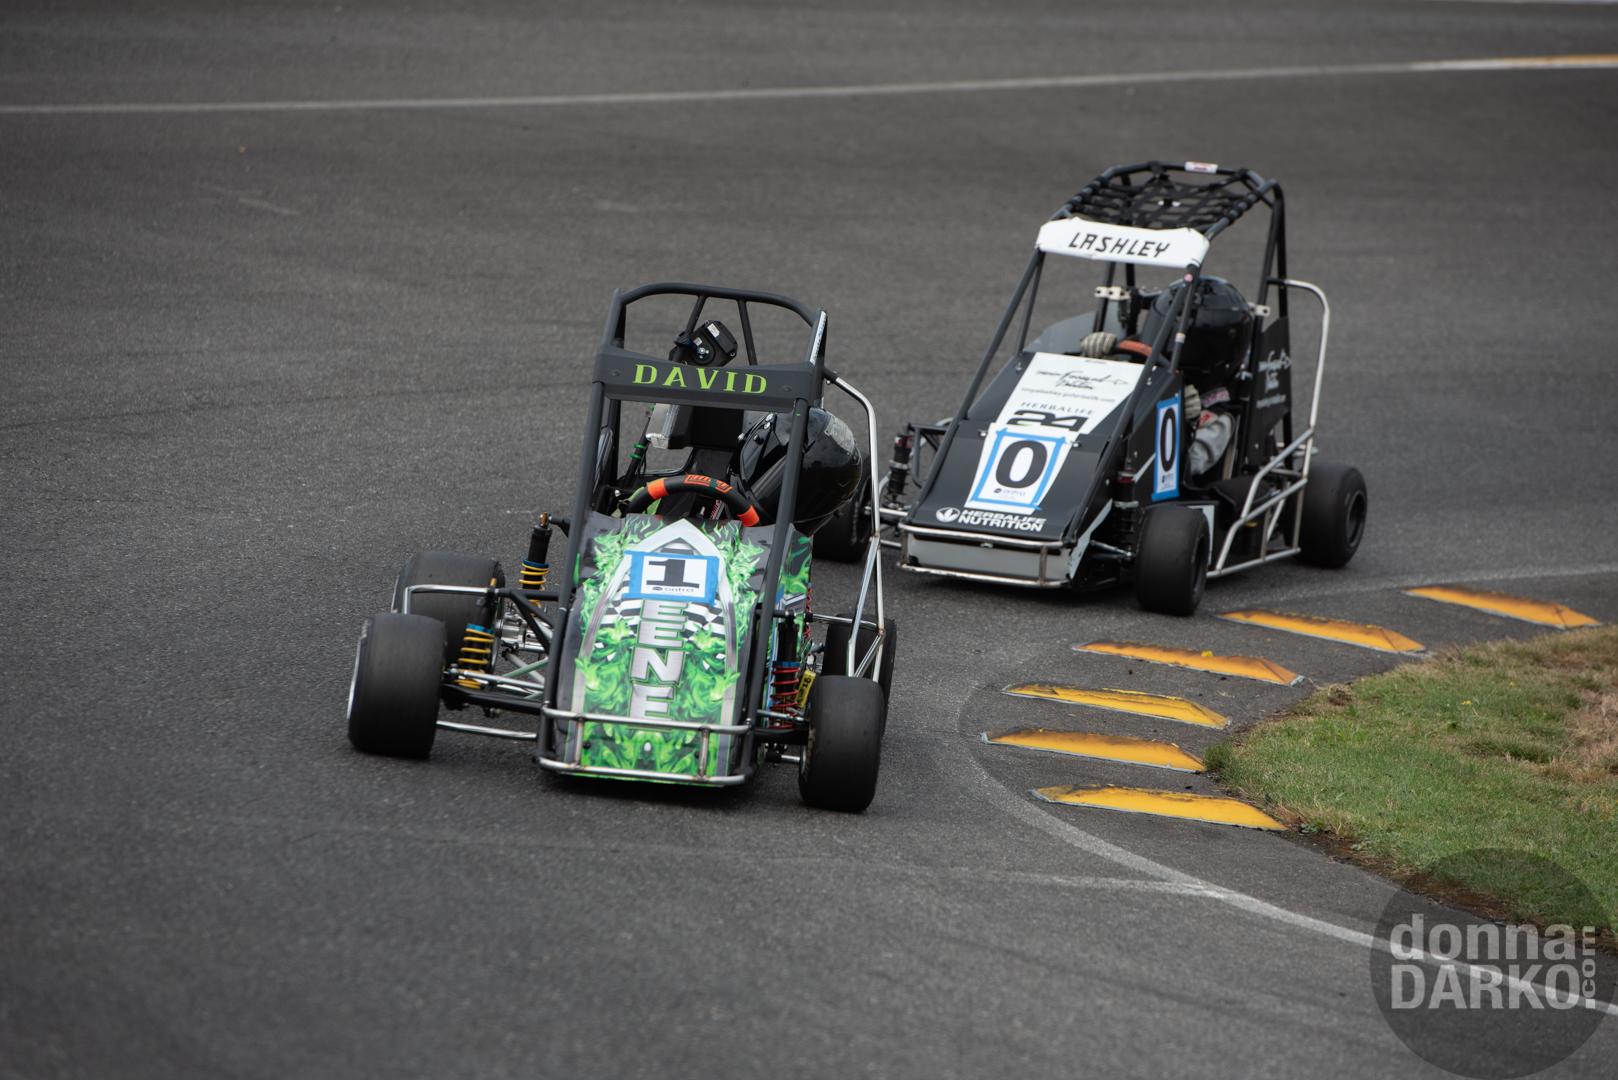 QWMA (Racing) 8-11-2019 DSC_7646.jpg